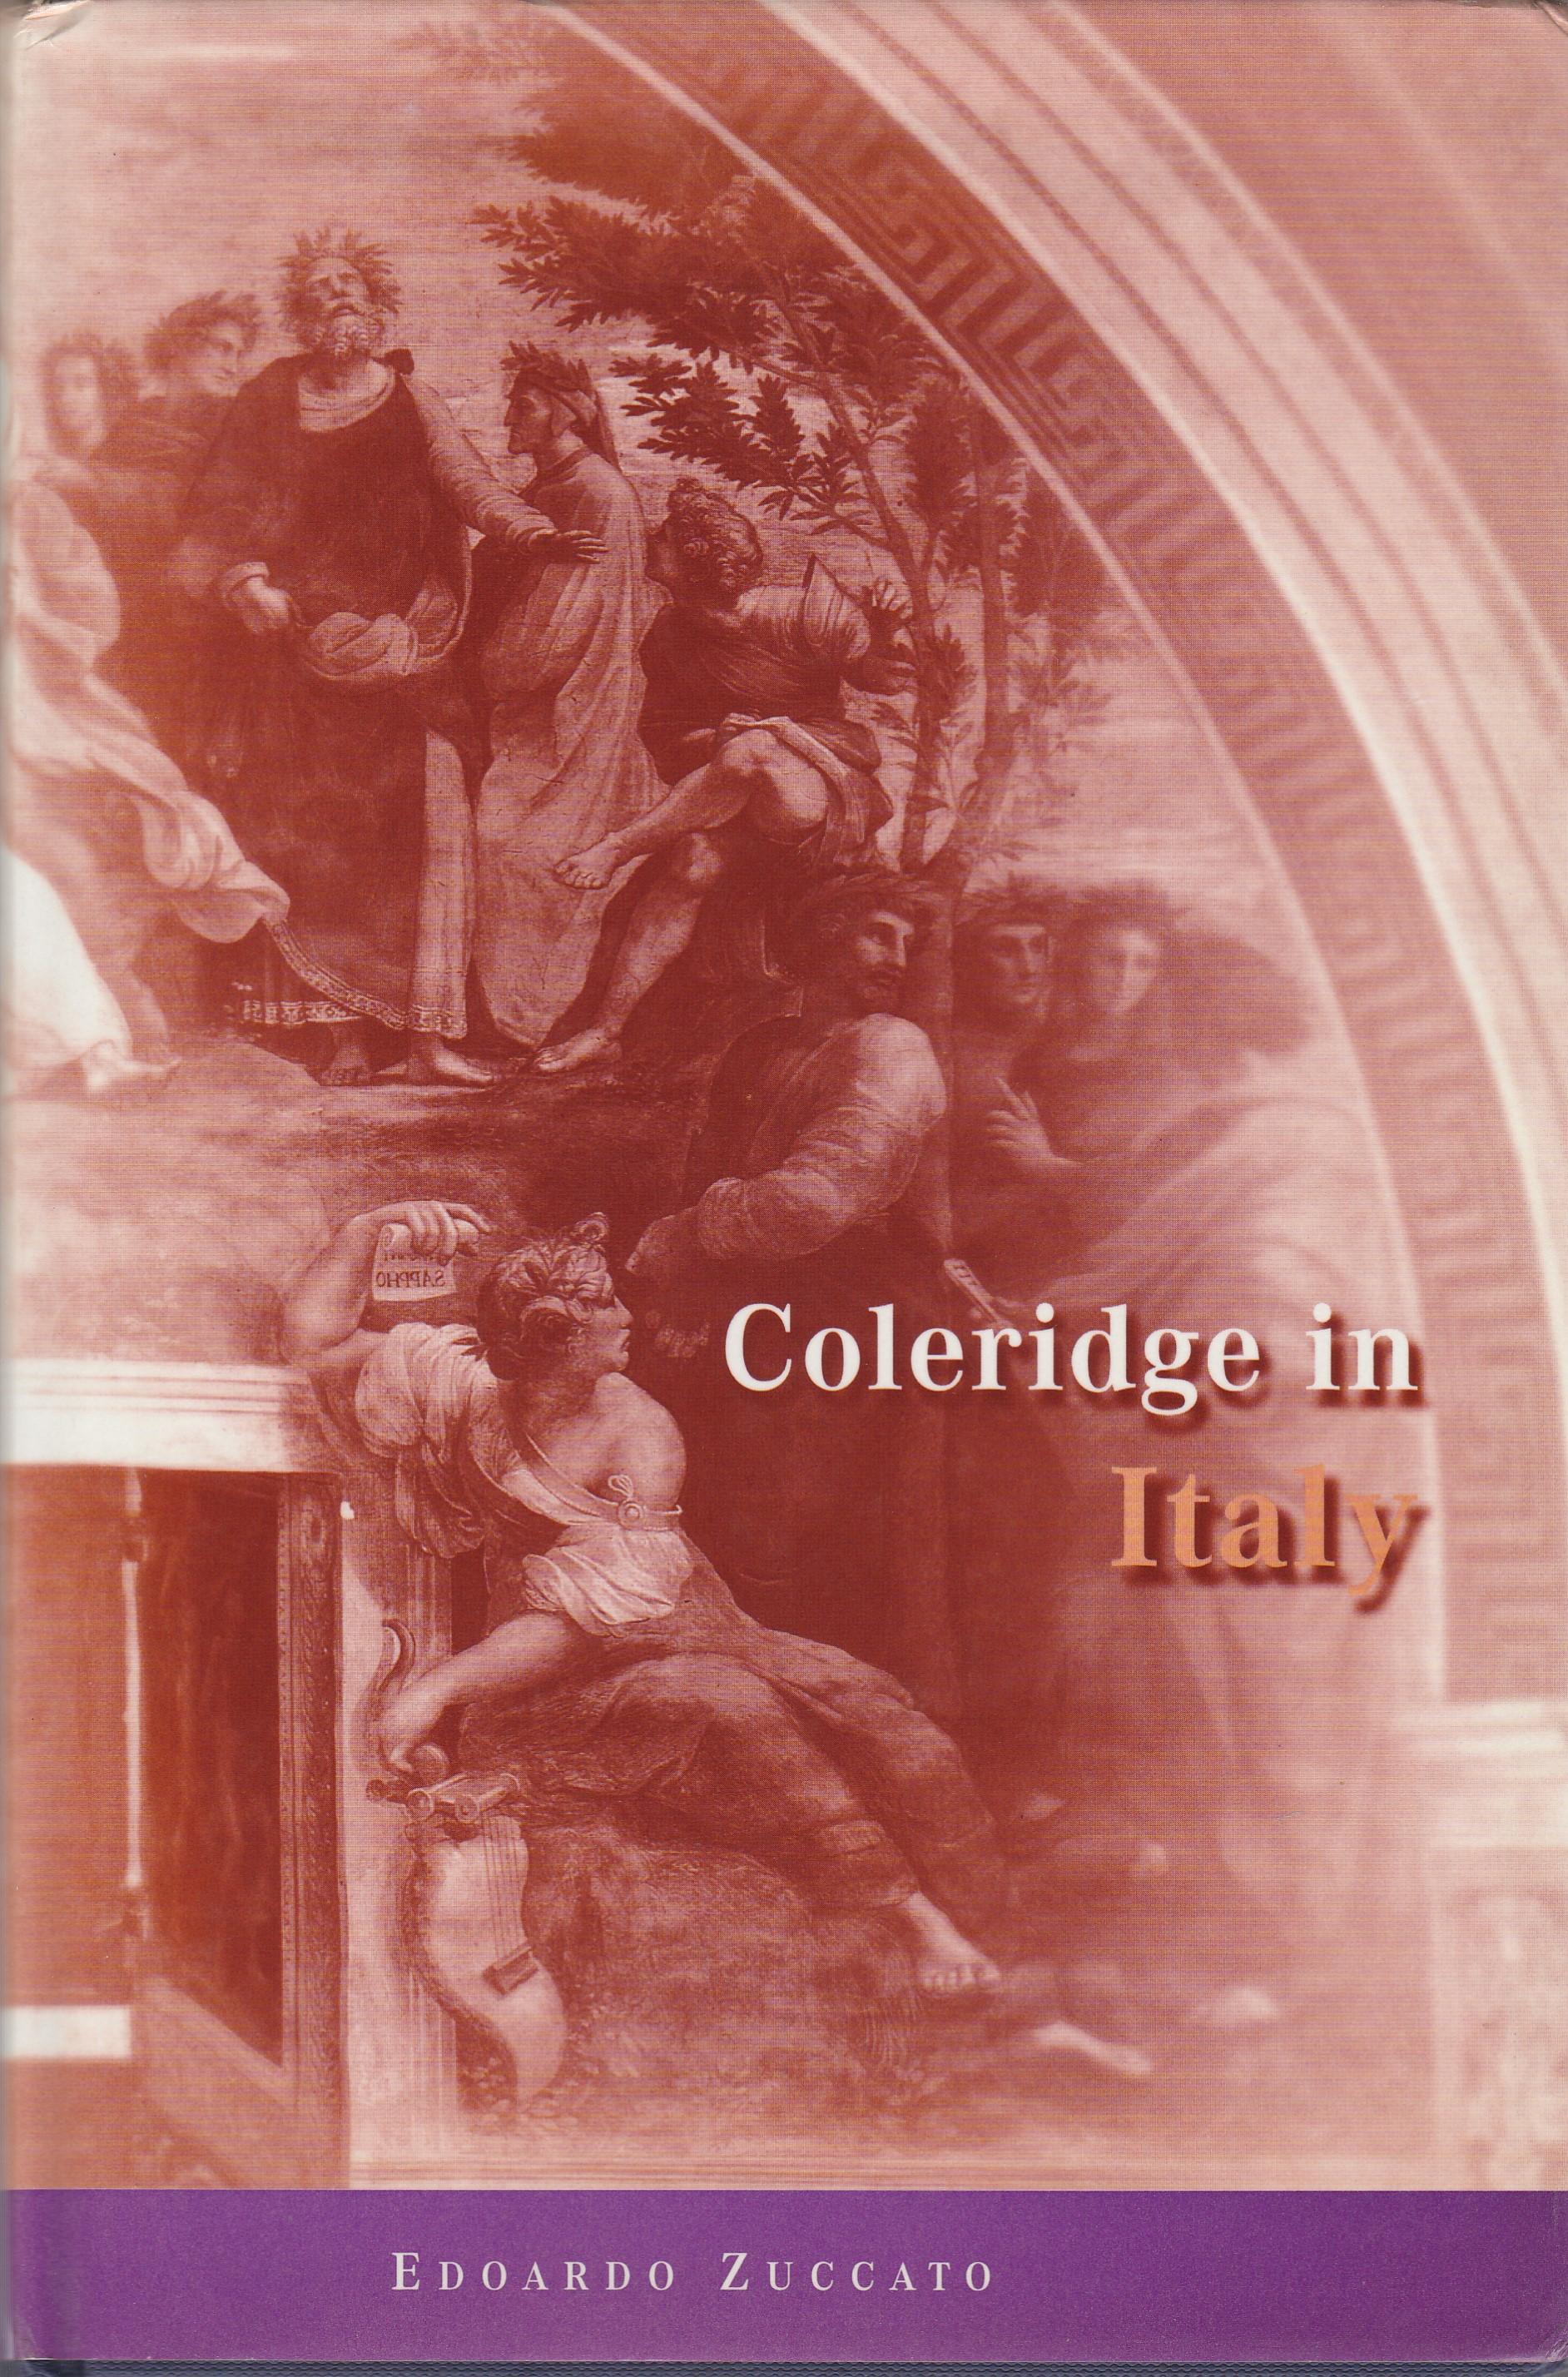 Coleridge in Italy